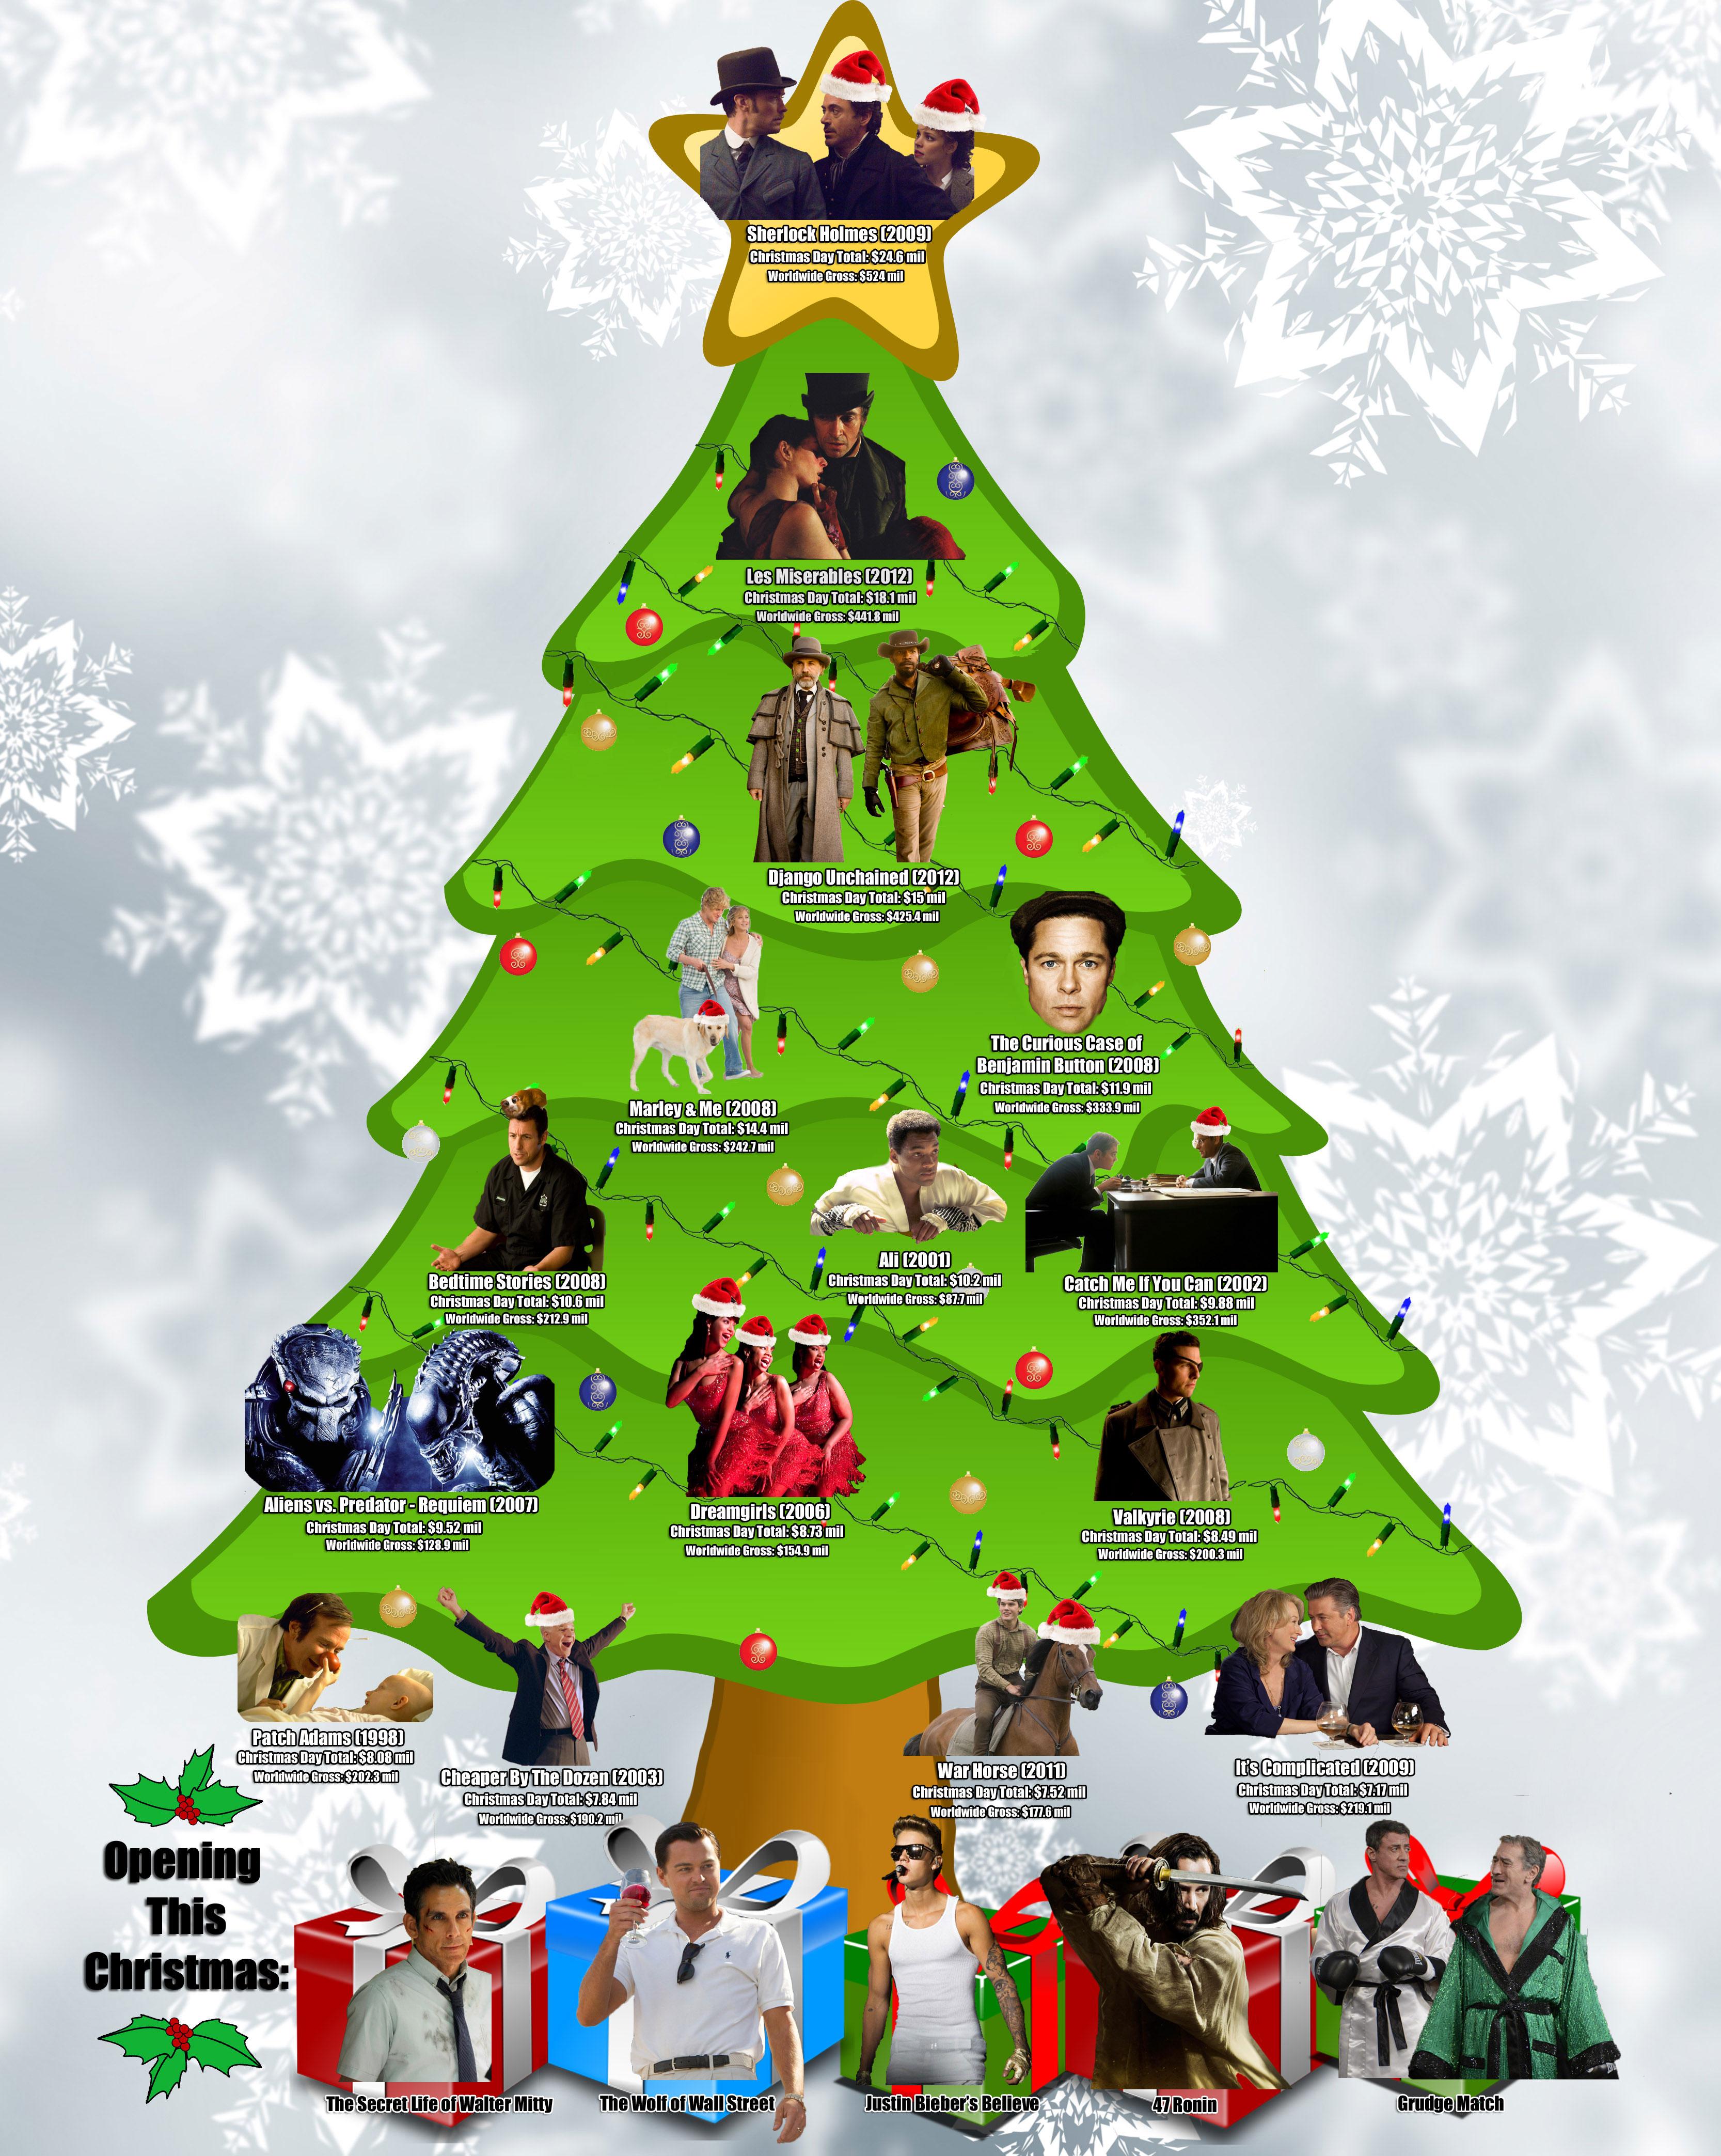 who ruled christmas sherlock holmes django and other